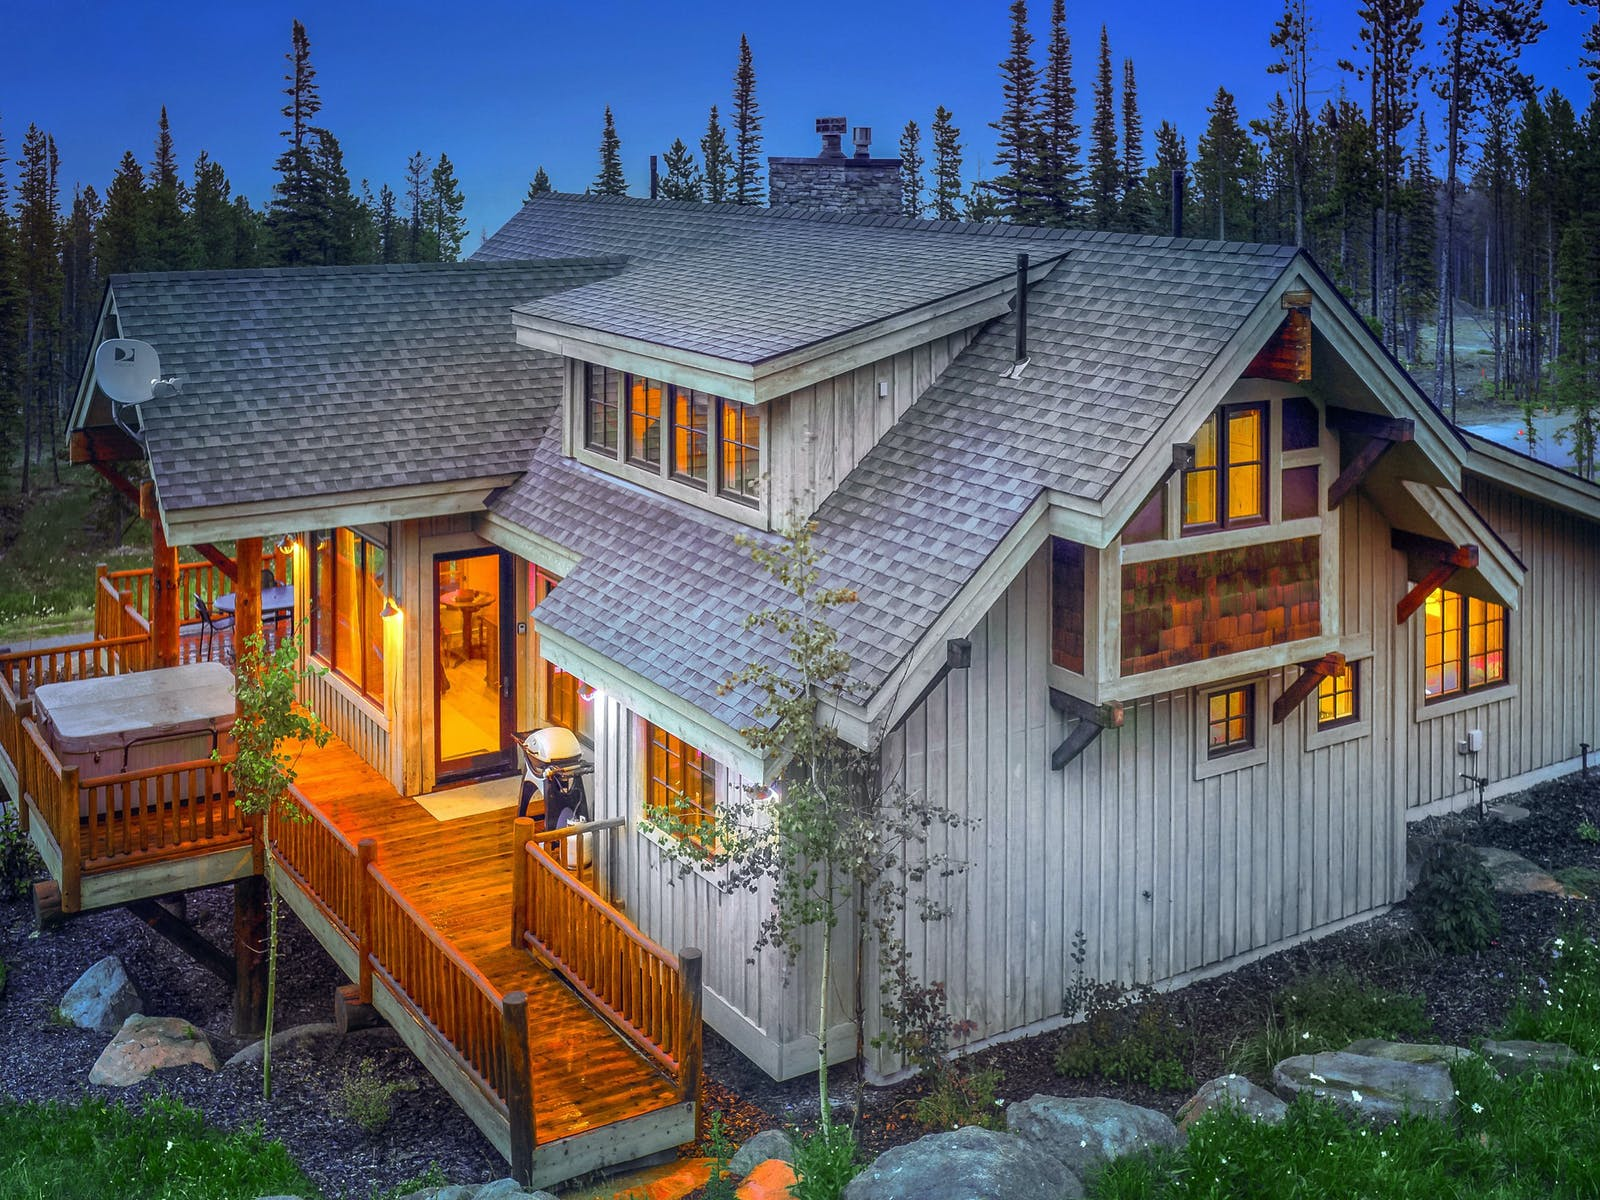 large cabin rental in Big Sky, MT lit up at night